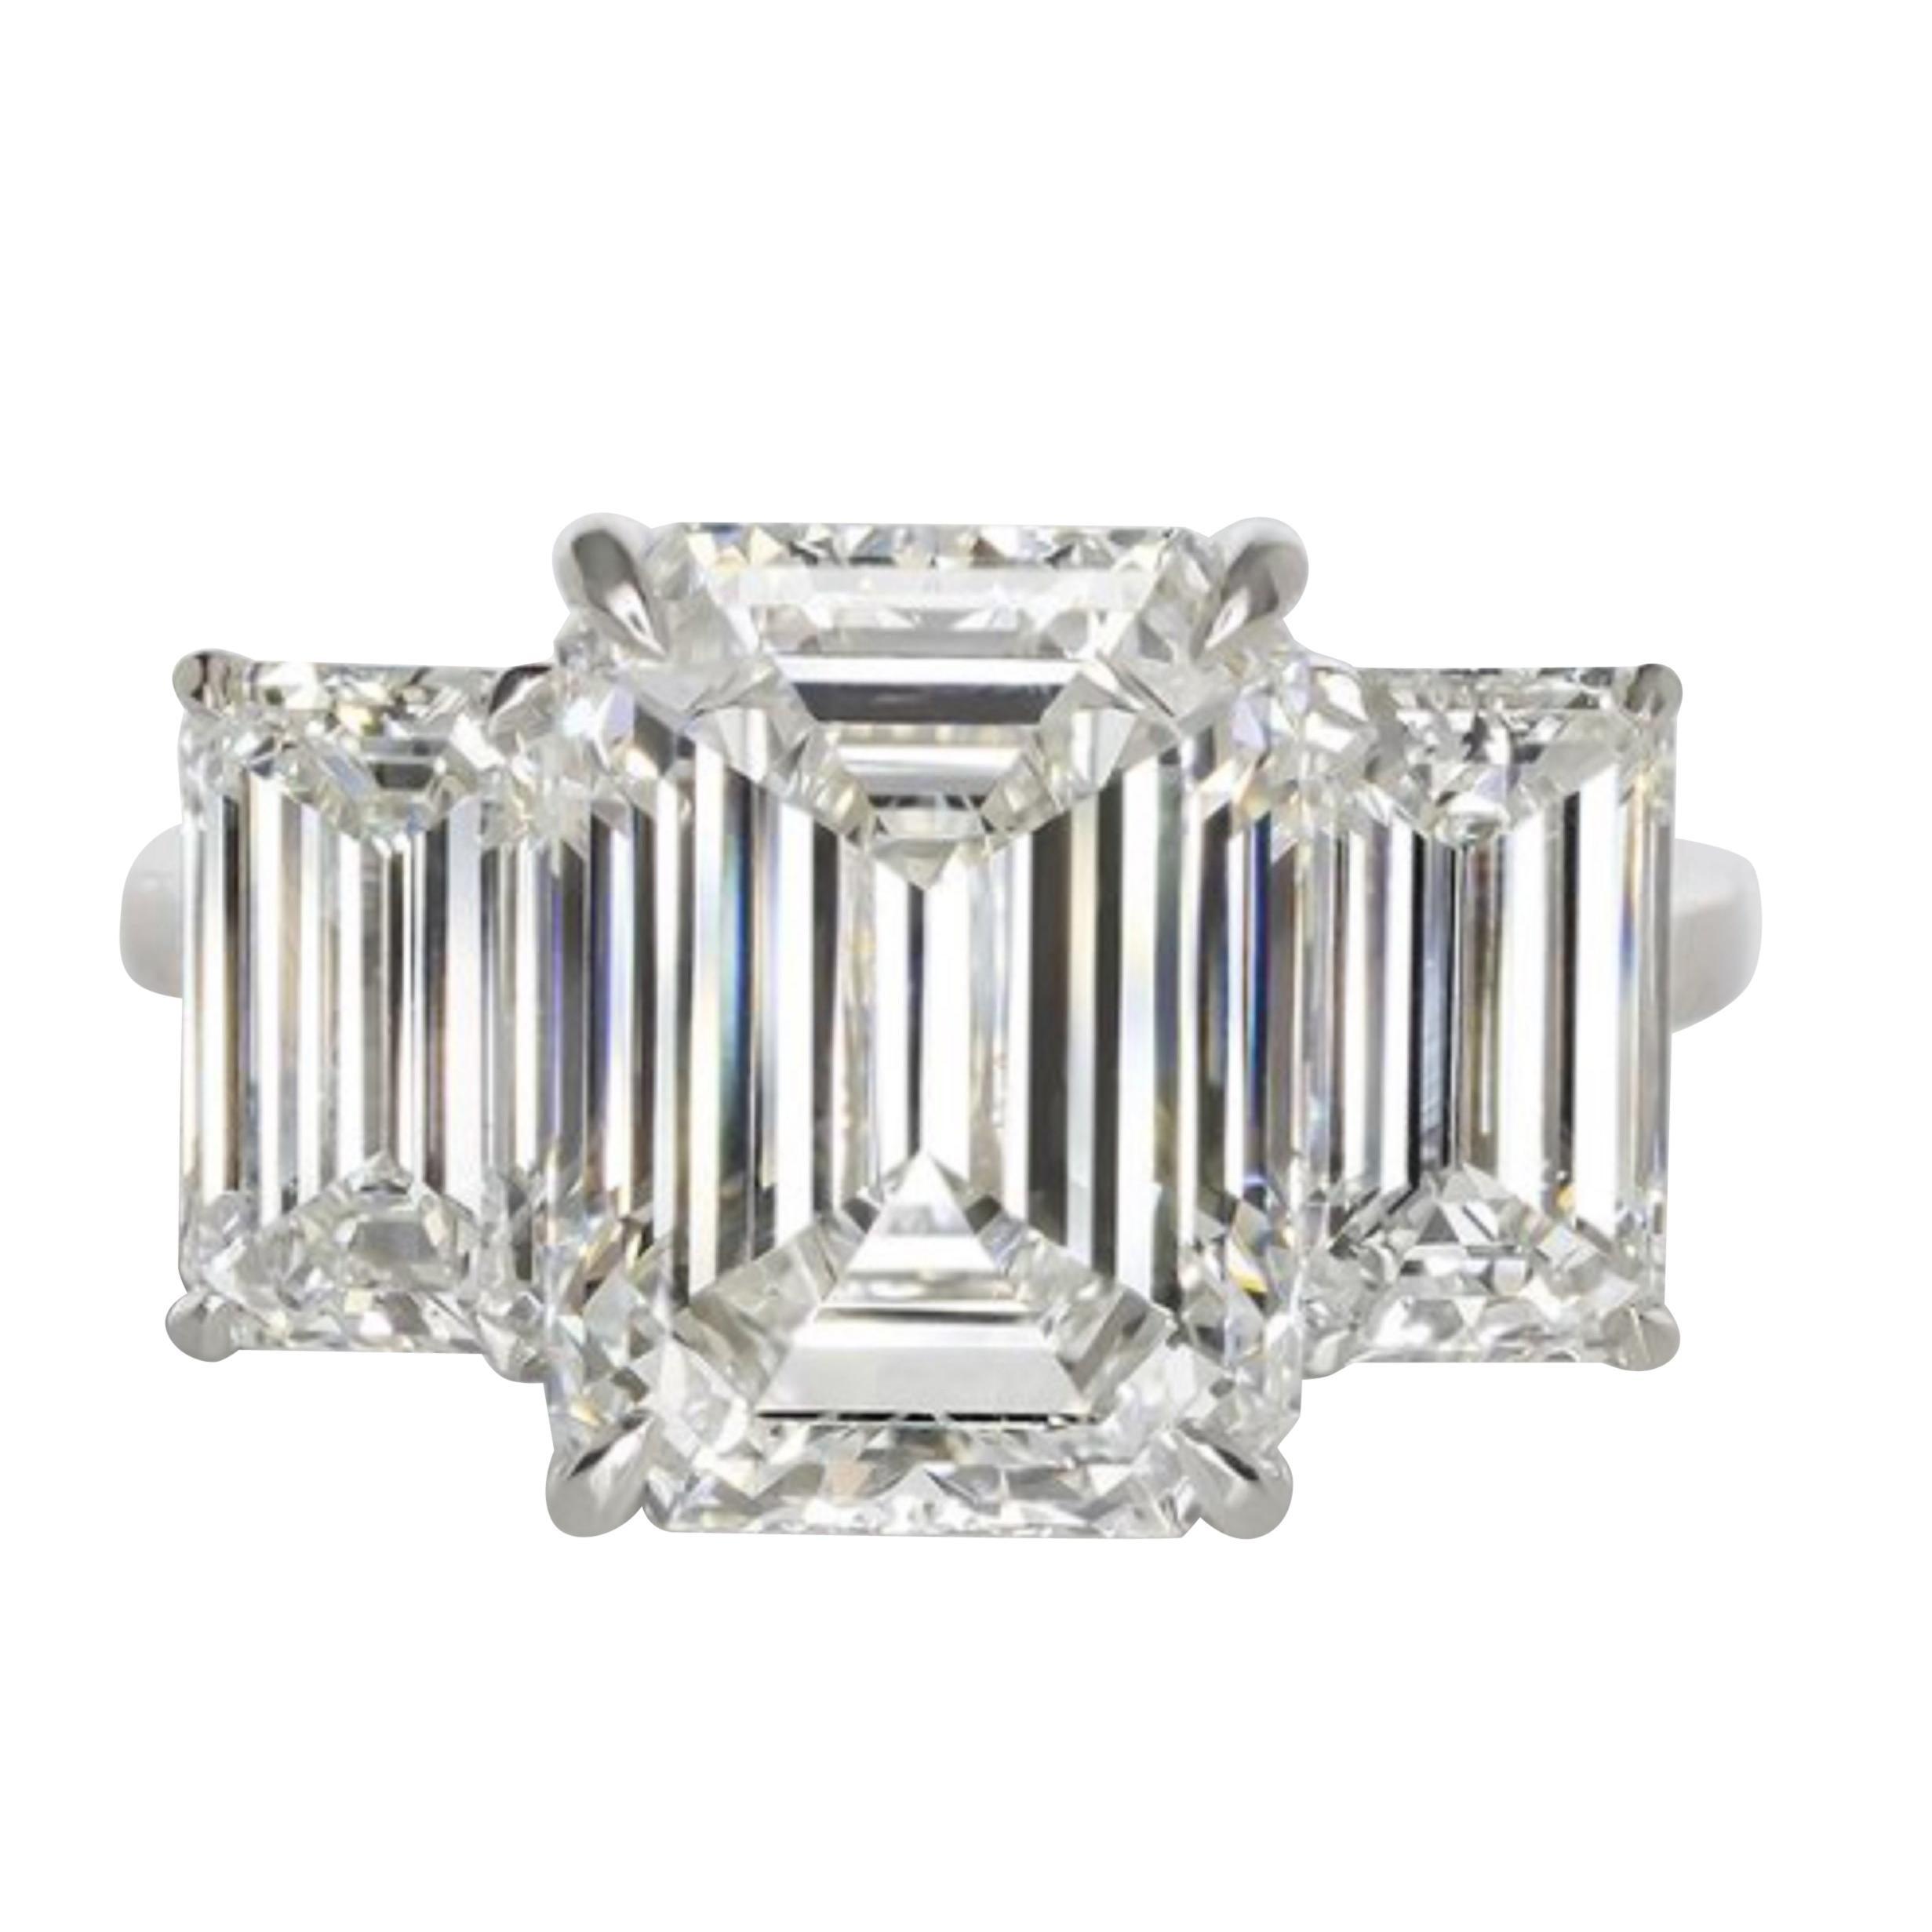 GIA Certified Three Stone Emerald Cut Platinum Ring